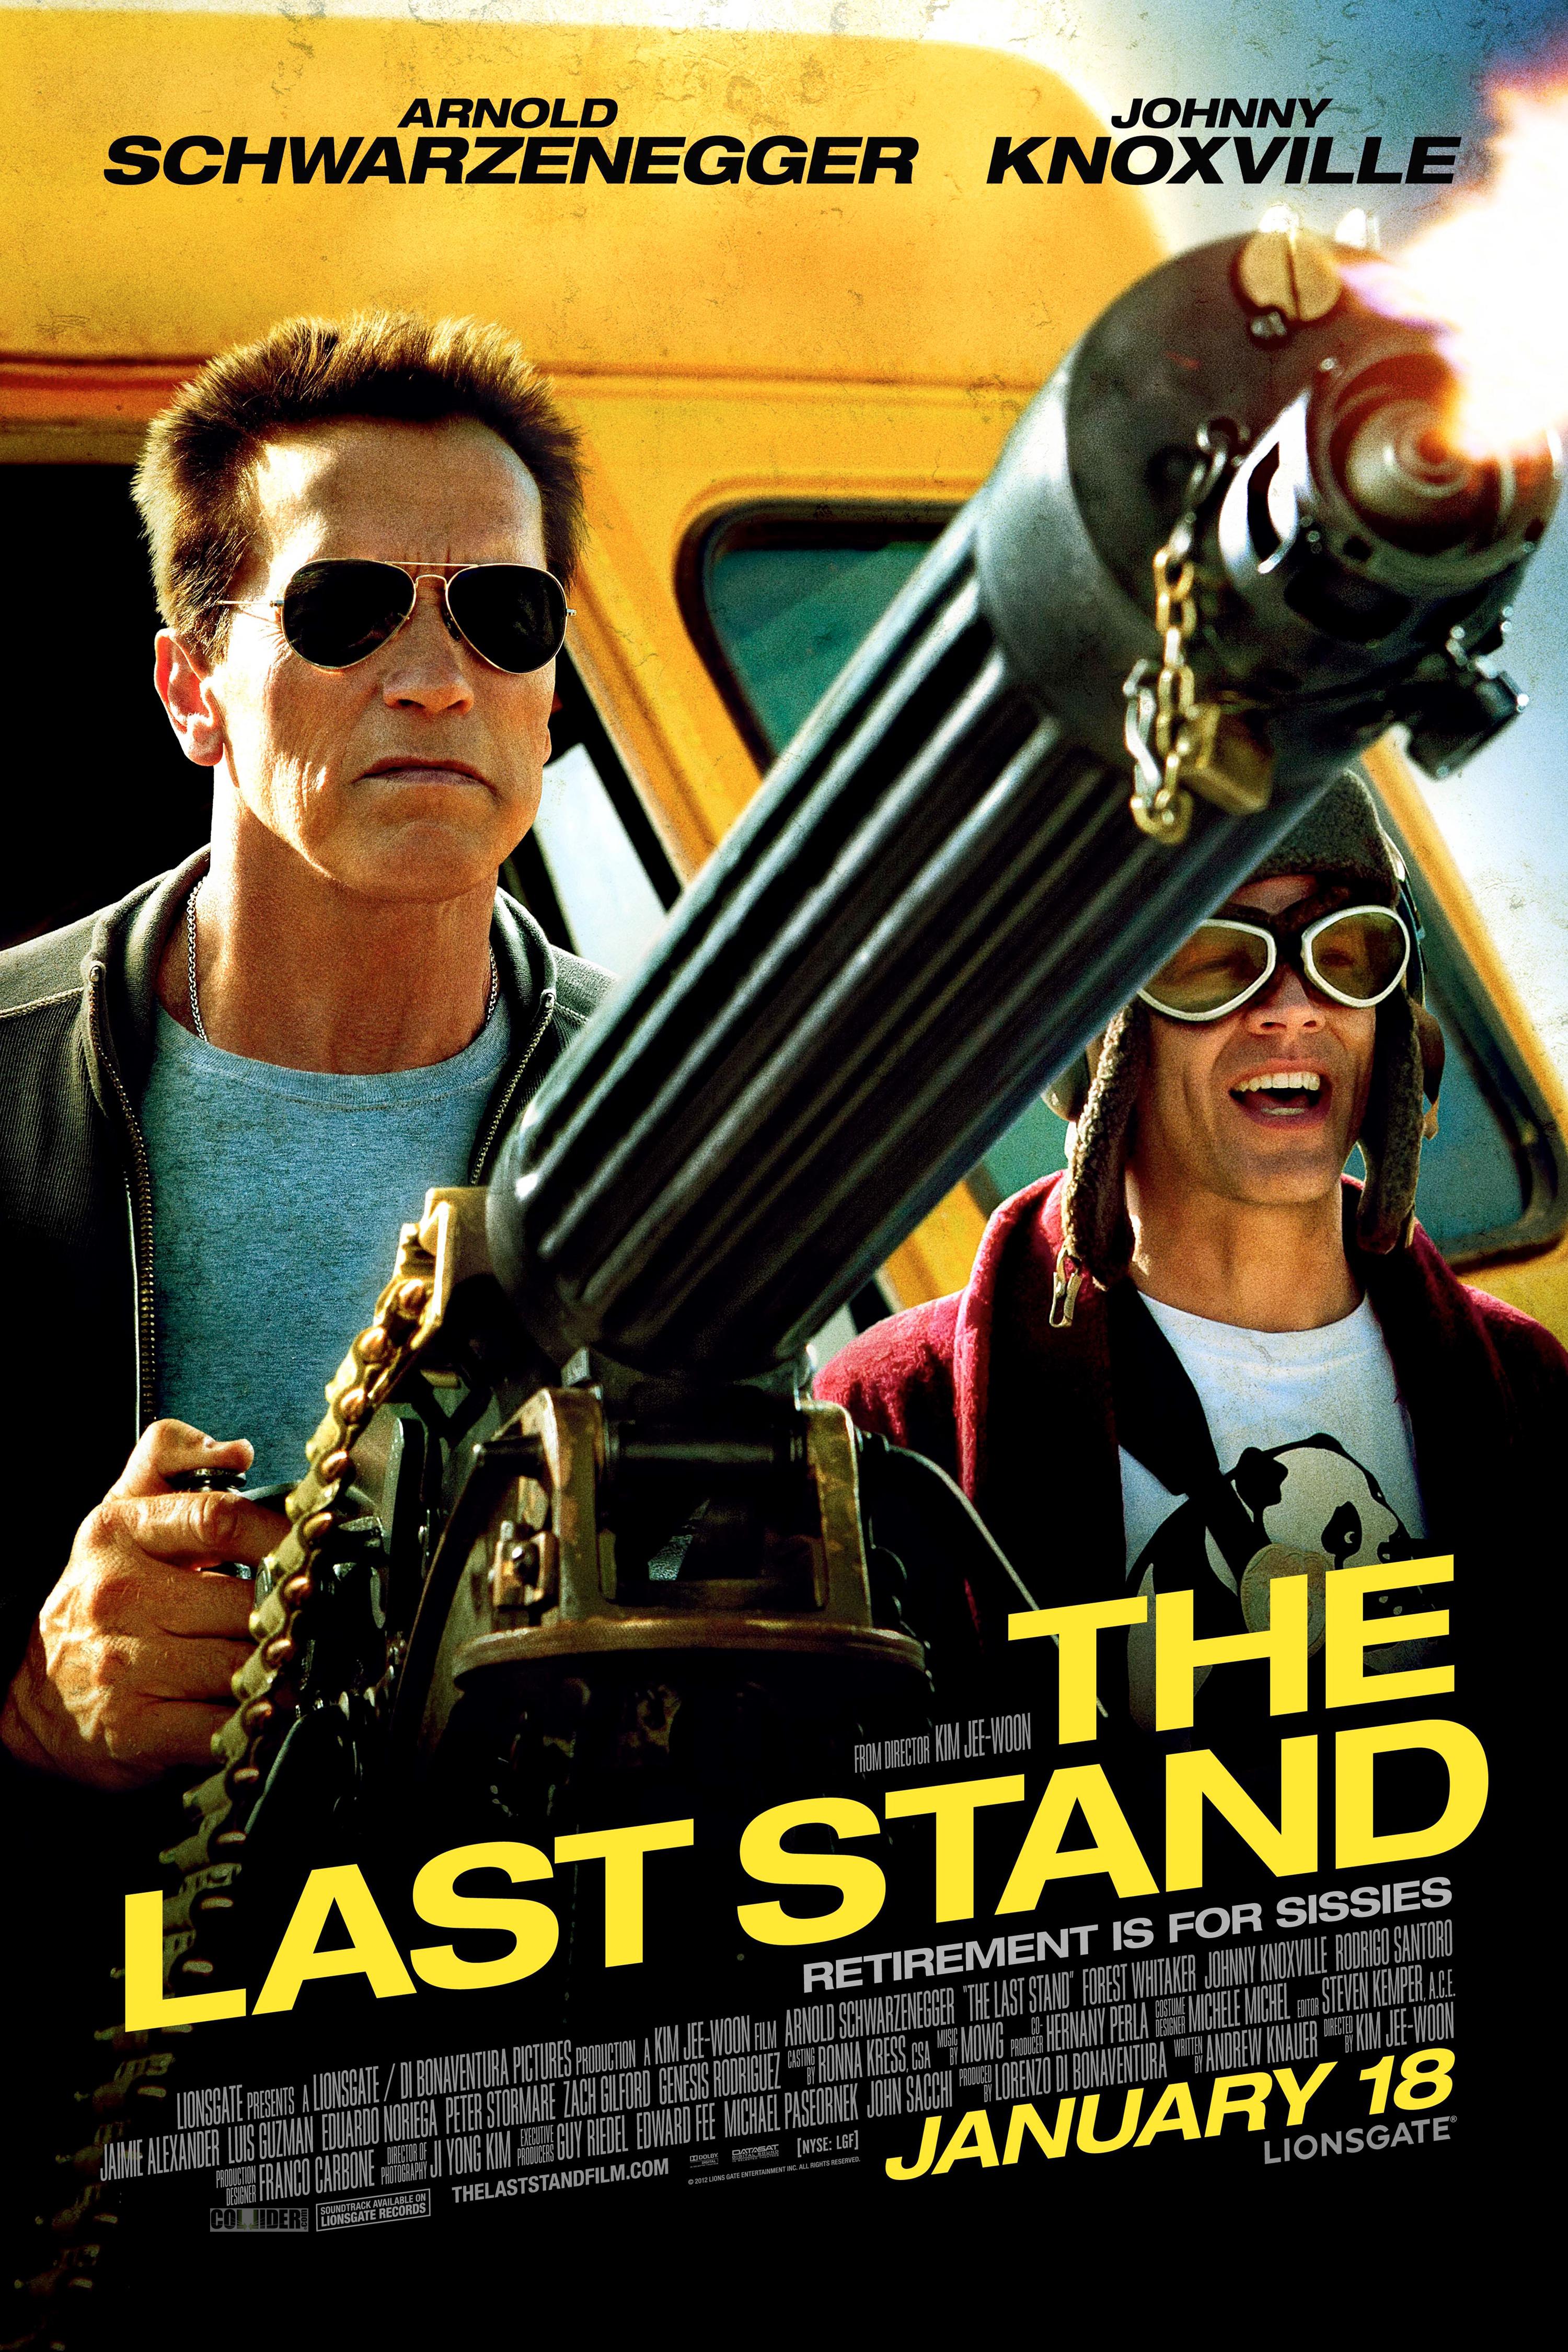 The Last Stand - Movie Poster #3 (Original)